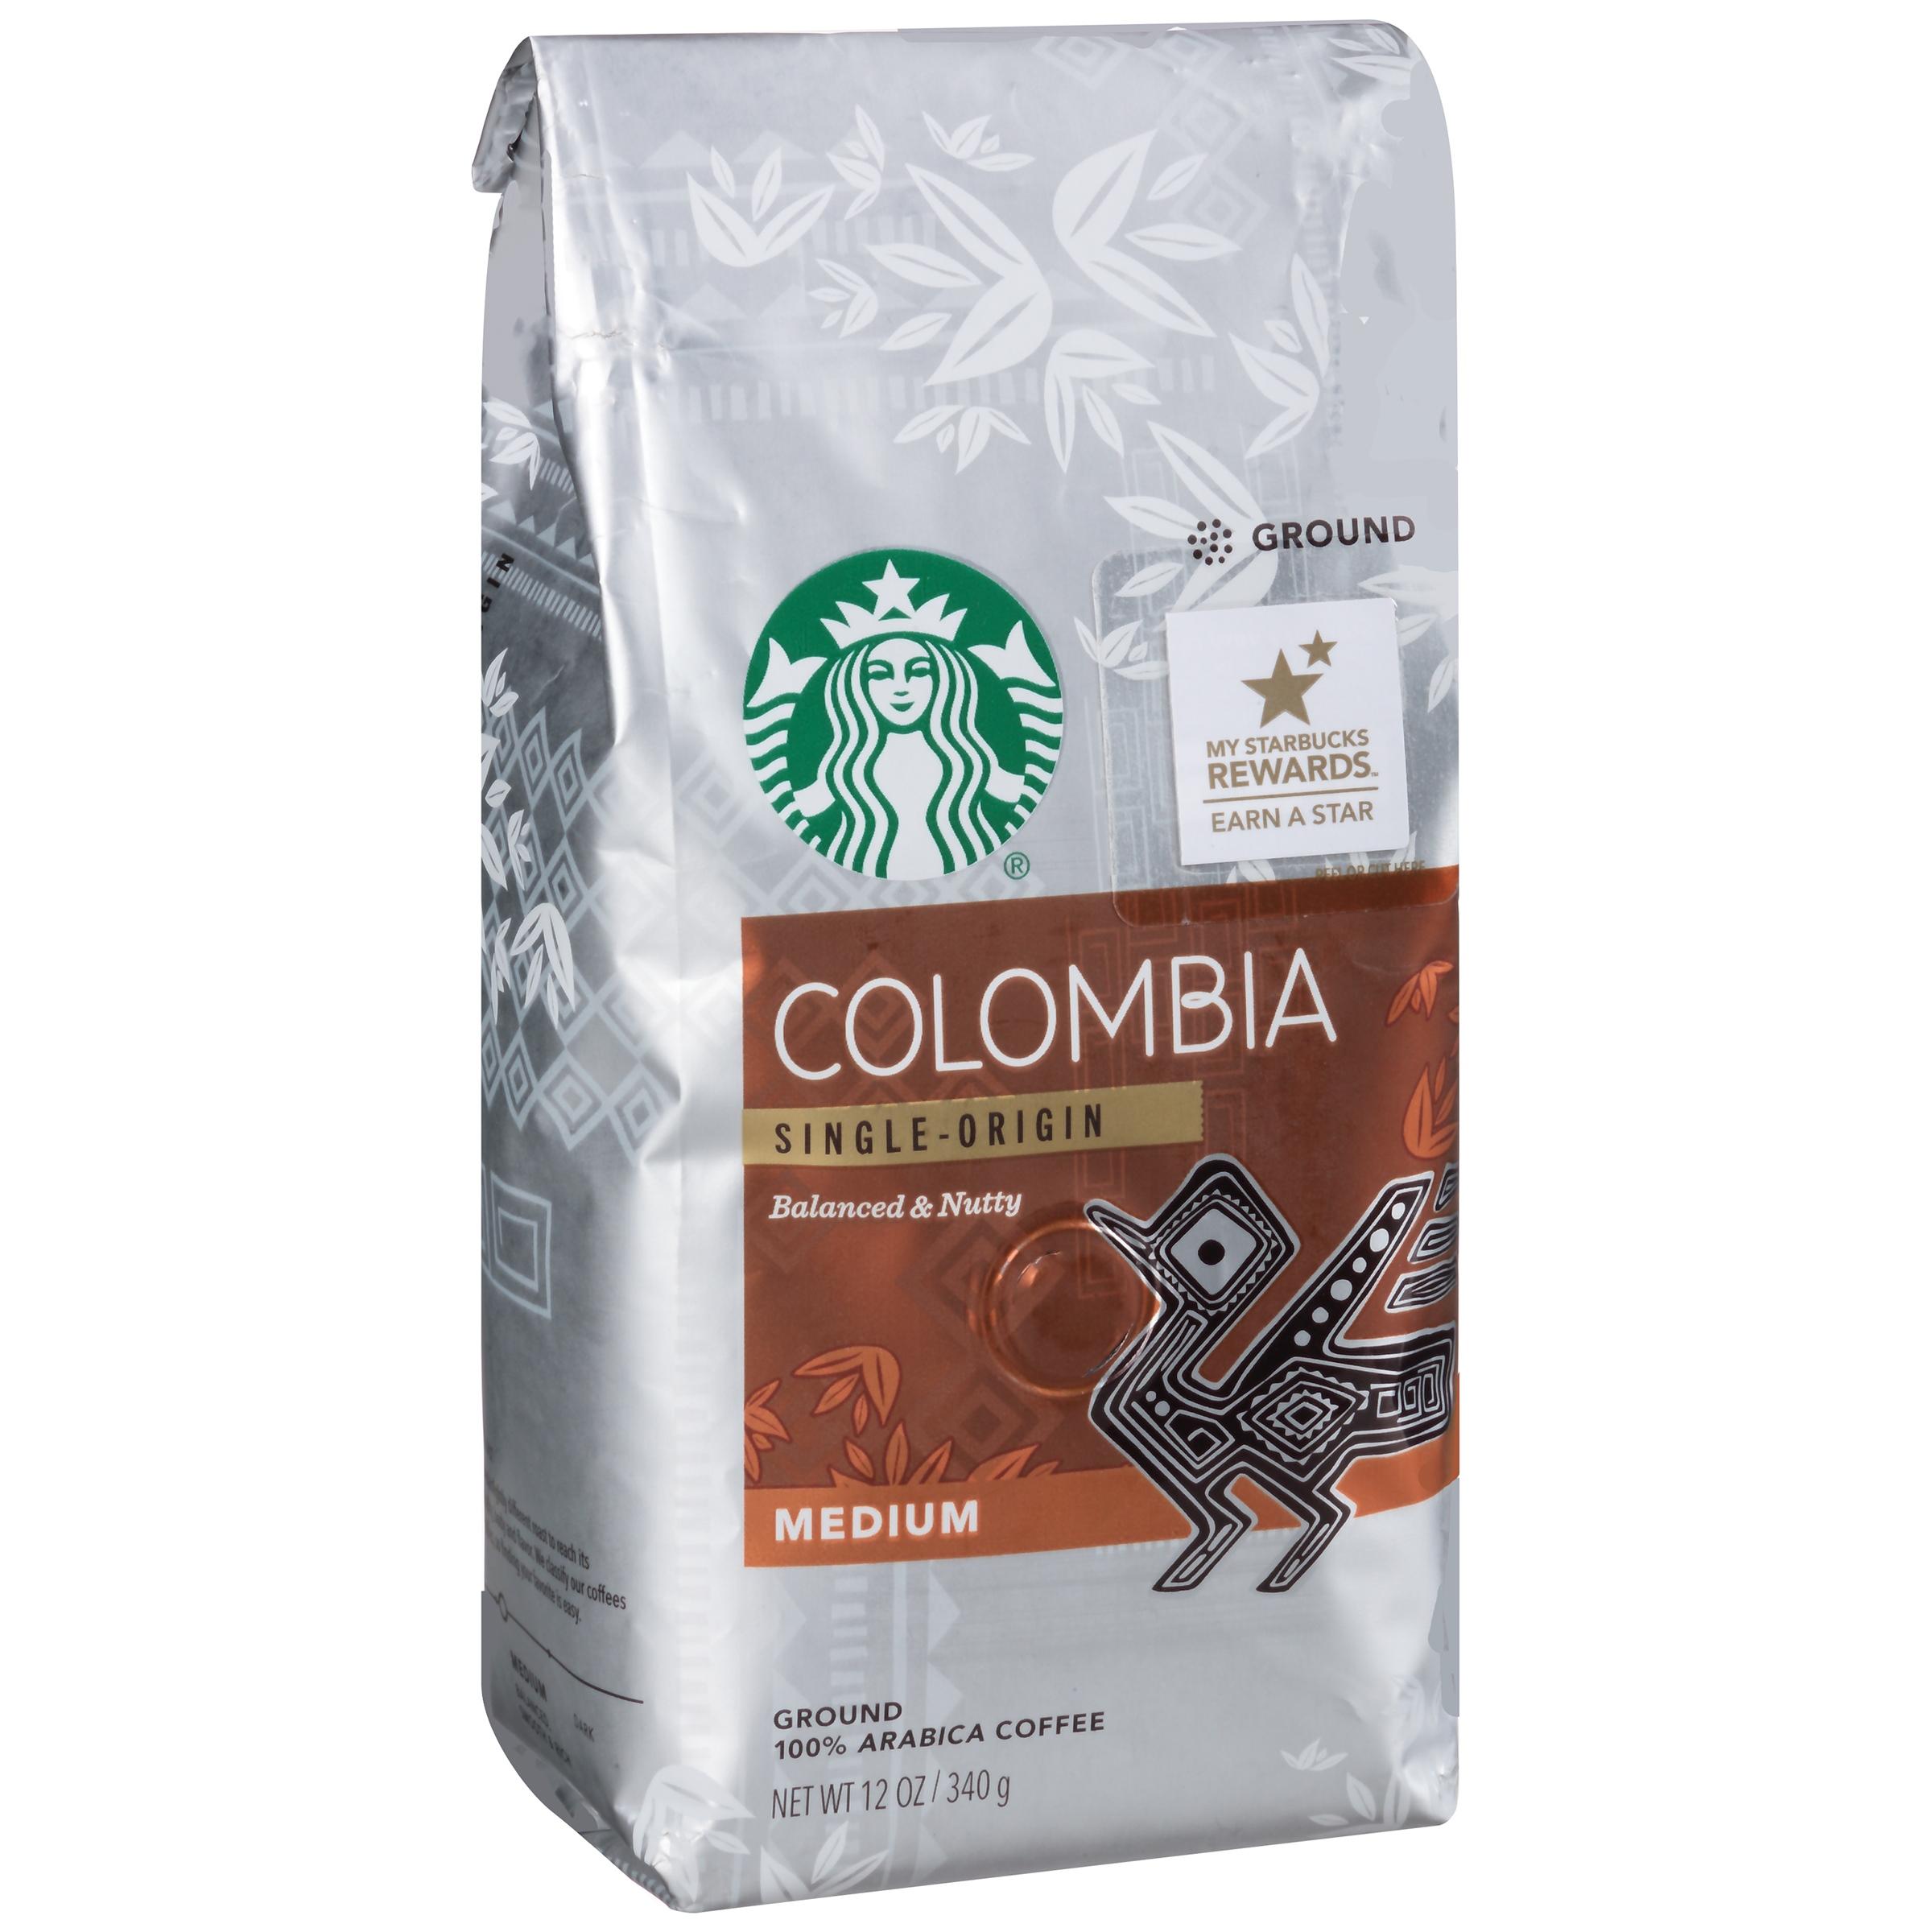 Starbucks Colombia Ground Coffee, 12 oz